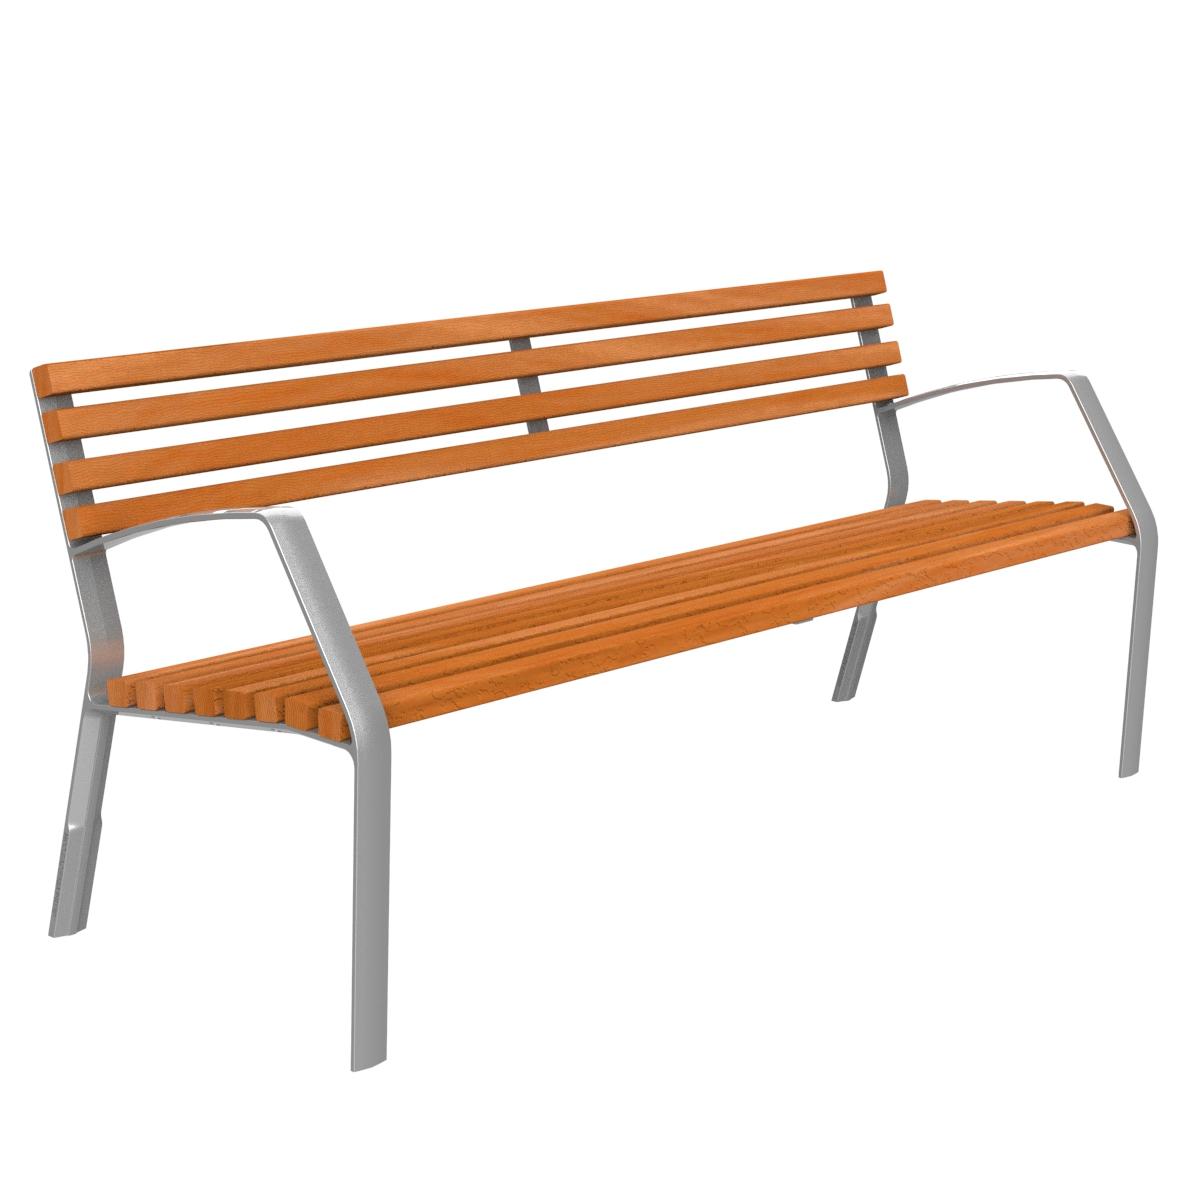 Banco MODO10-ROMANTICO madera de Guinea C1 y pata de aluminio MODO10